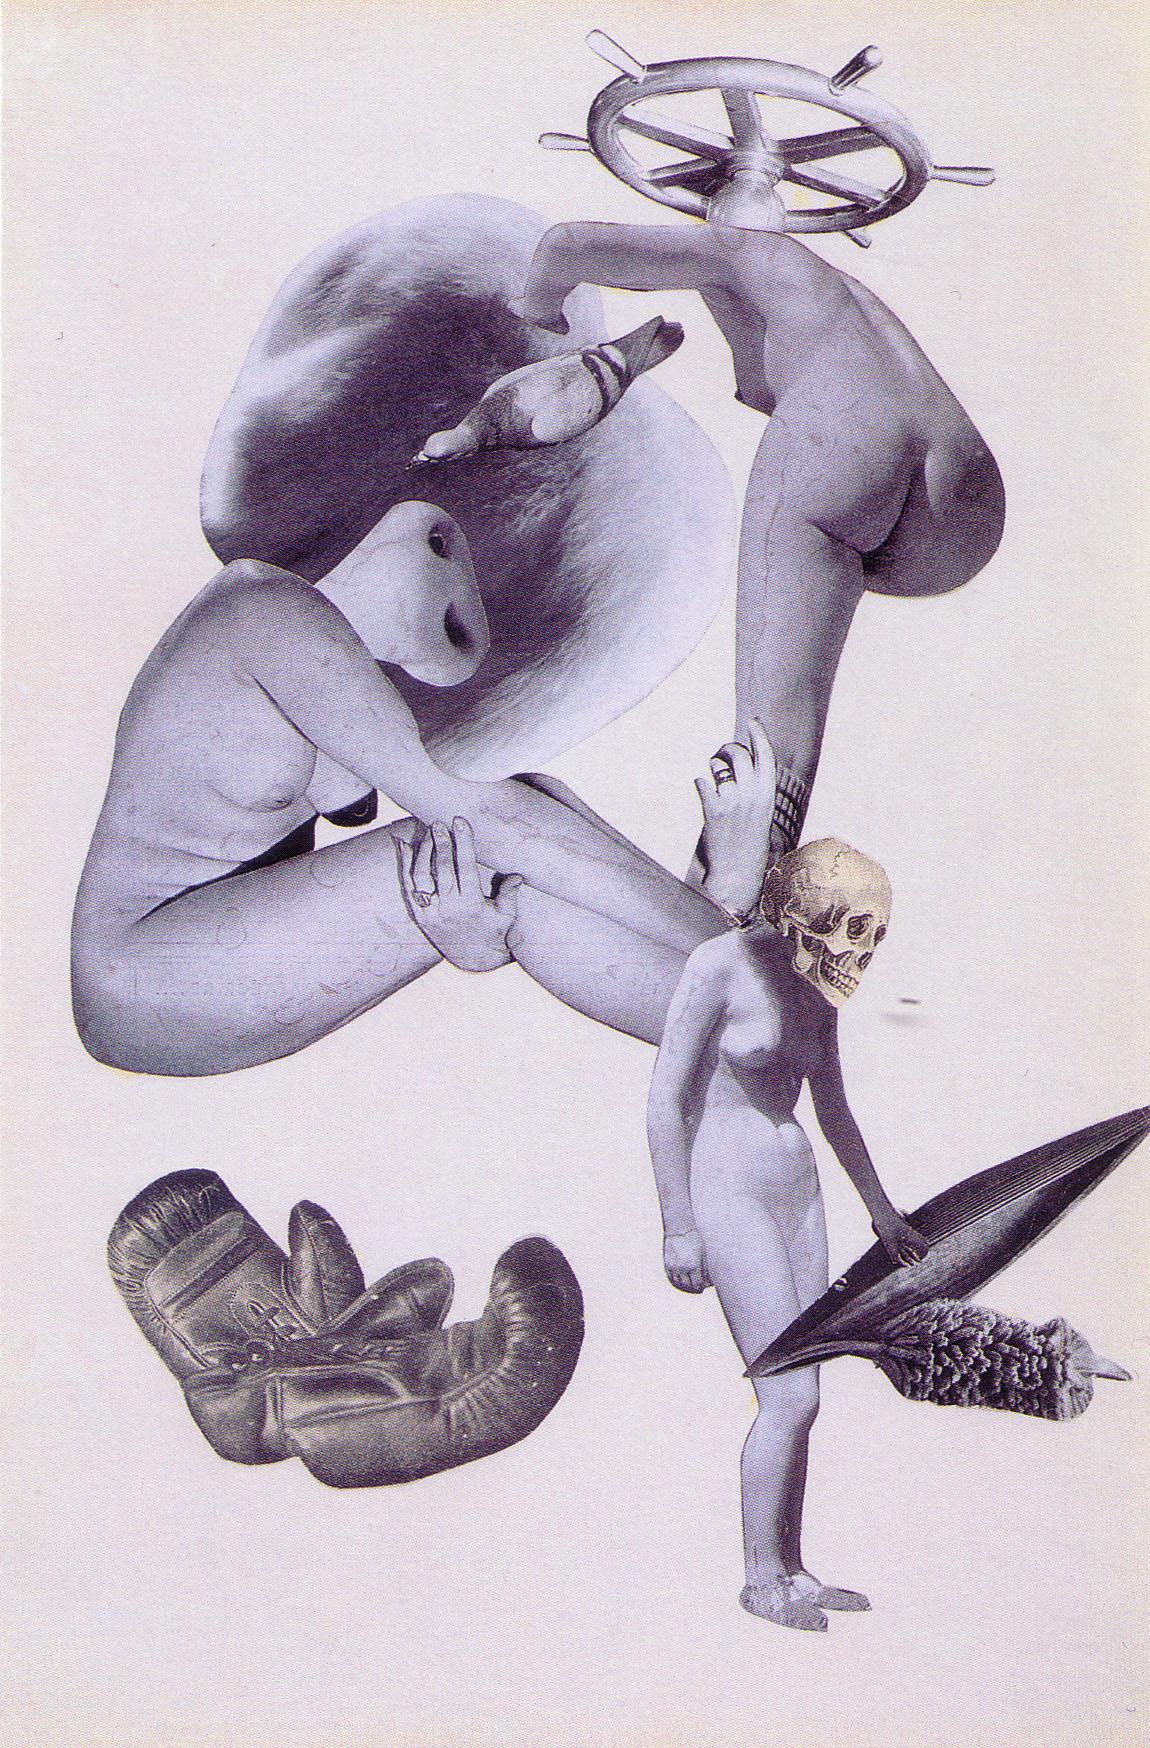 Karel Teige-Collage #88, 1939 (c) Nachlass Karel Teige